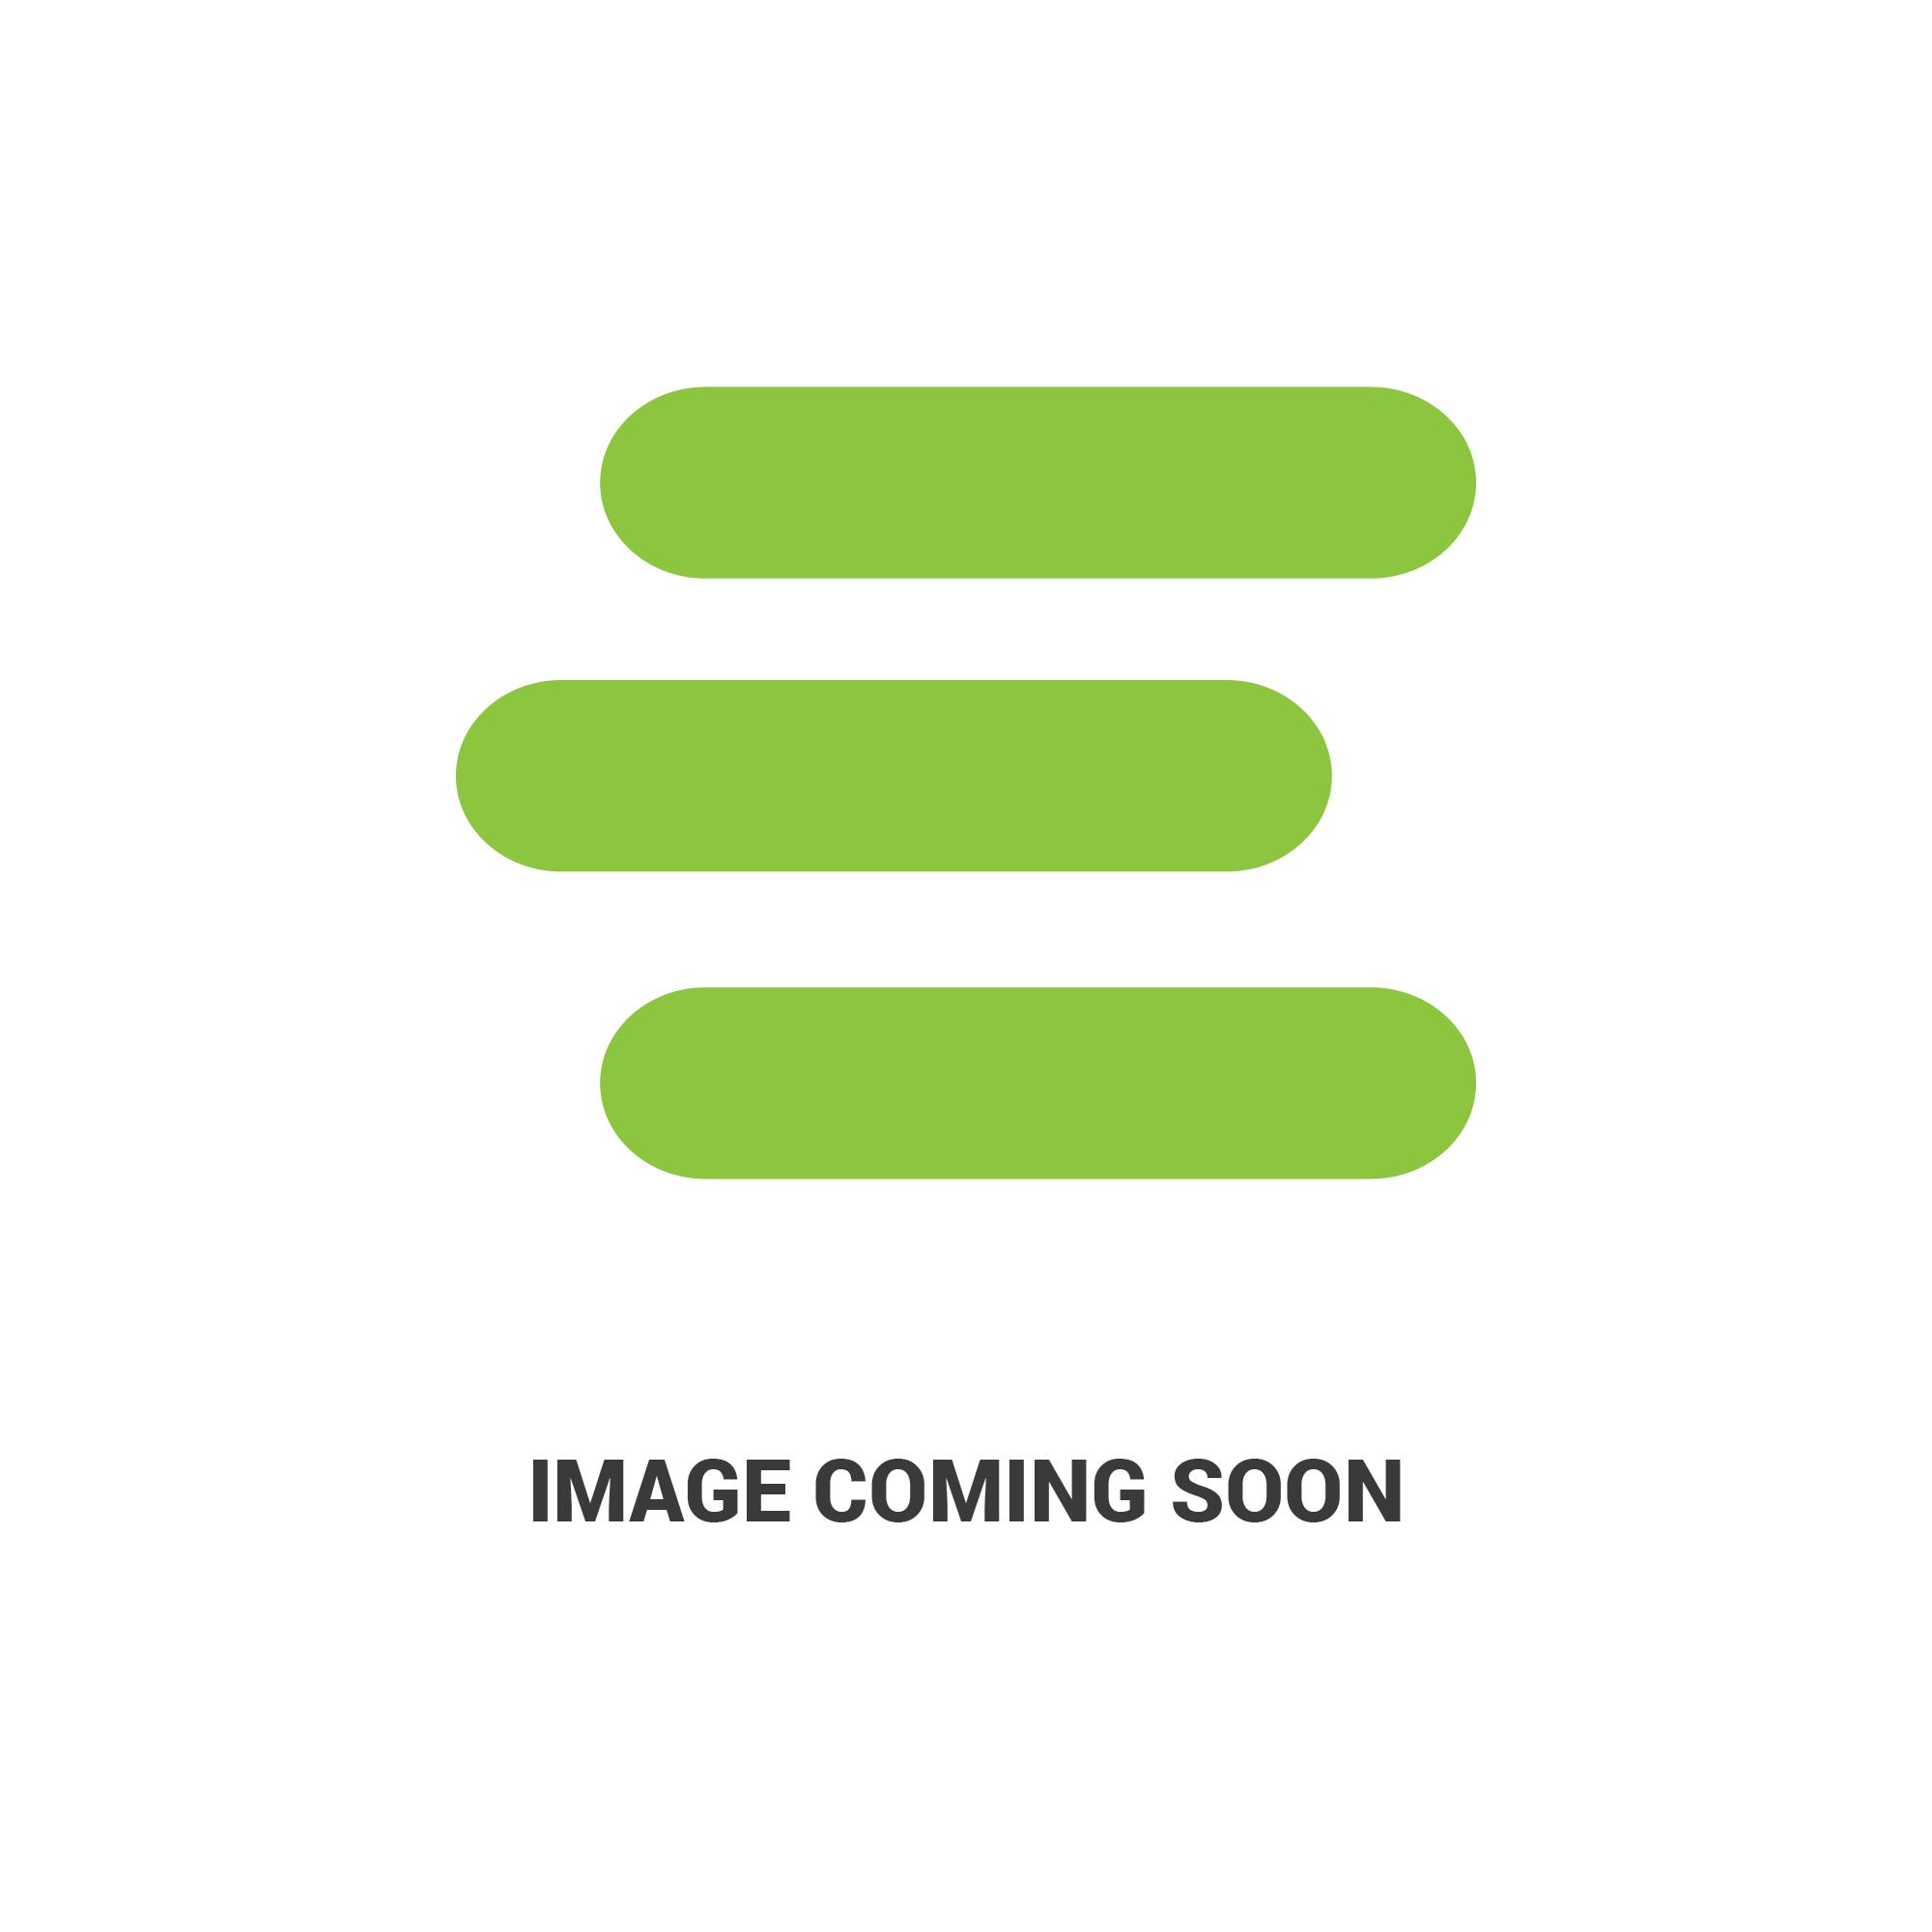 E-67106461876_10.jpg